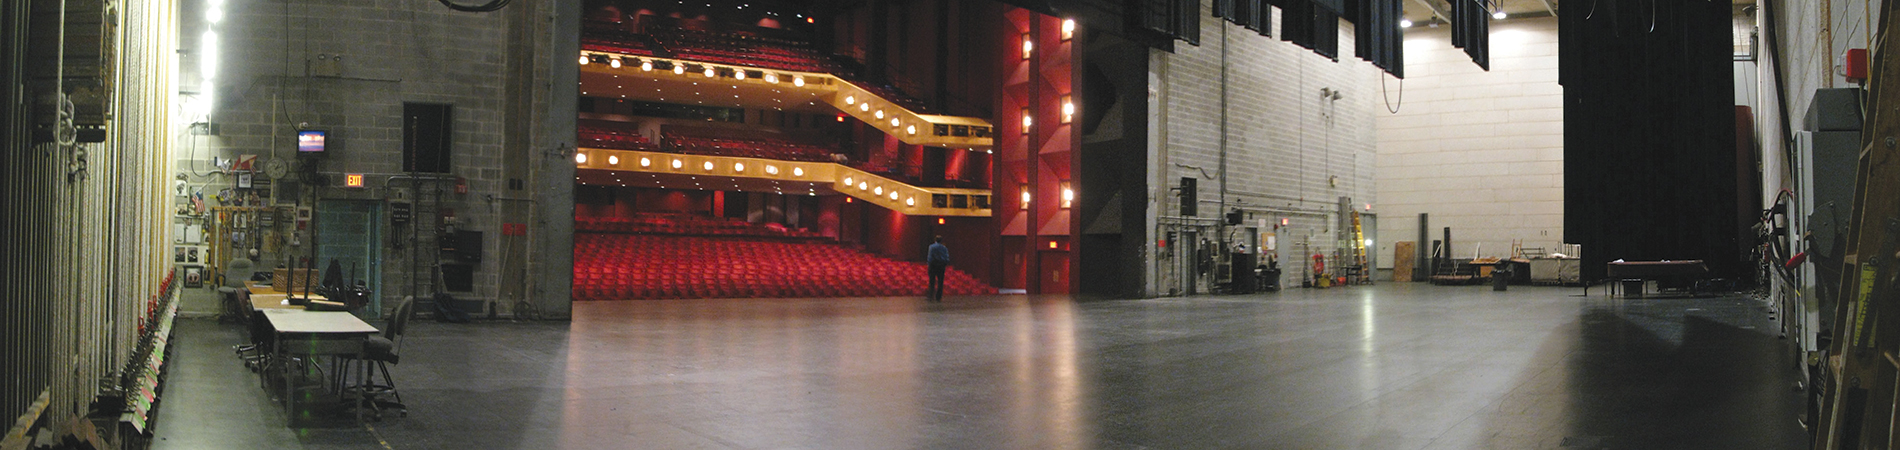 1617_BackstagePass_ConcertHallStage